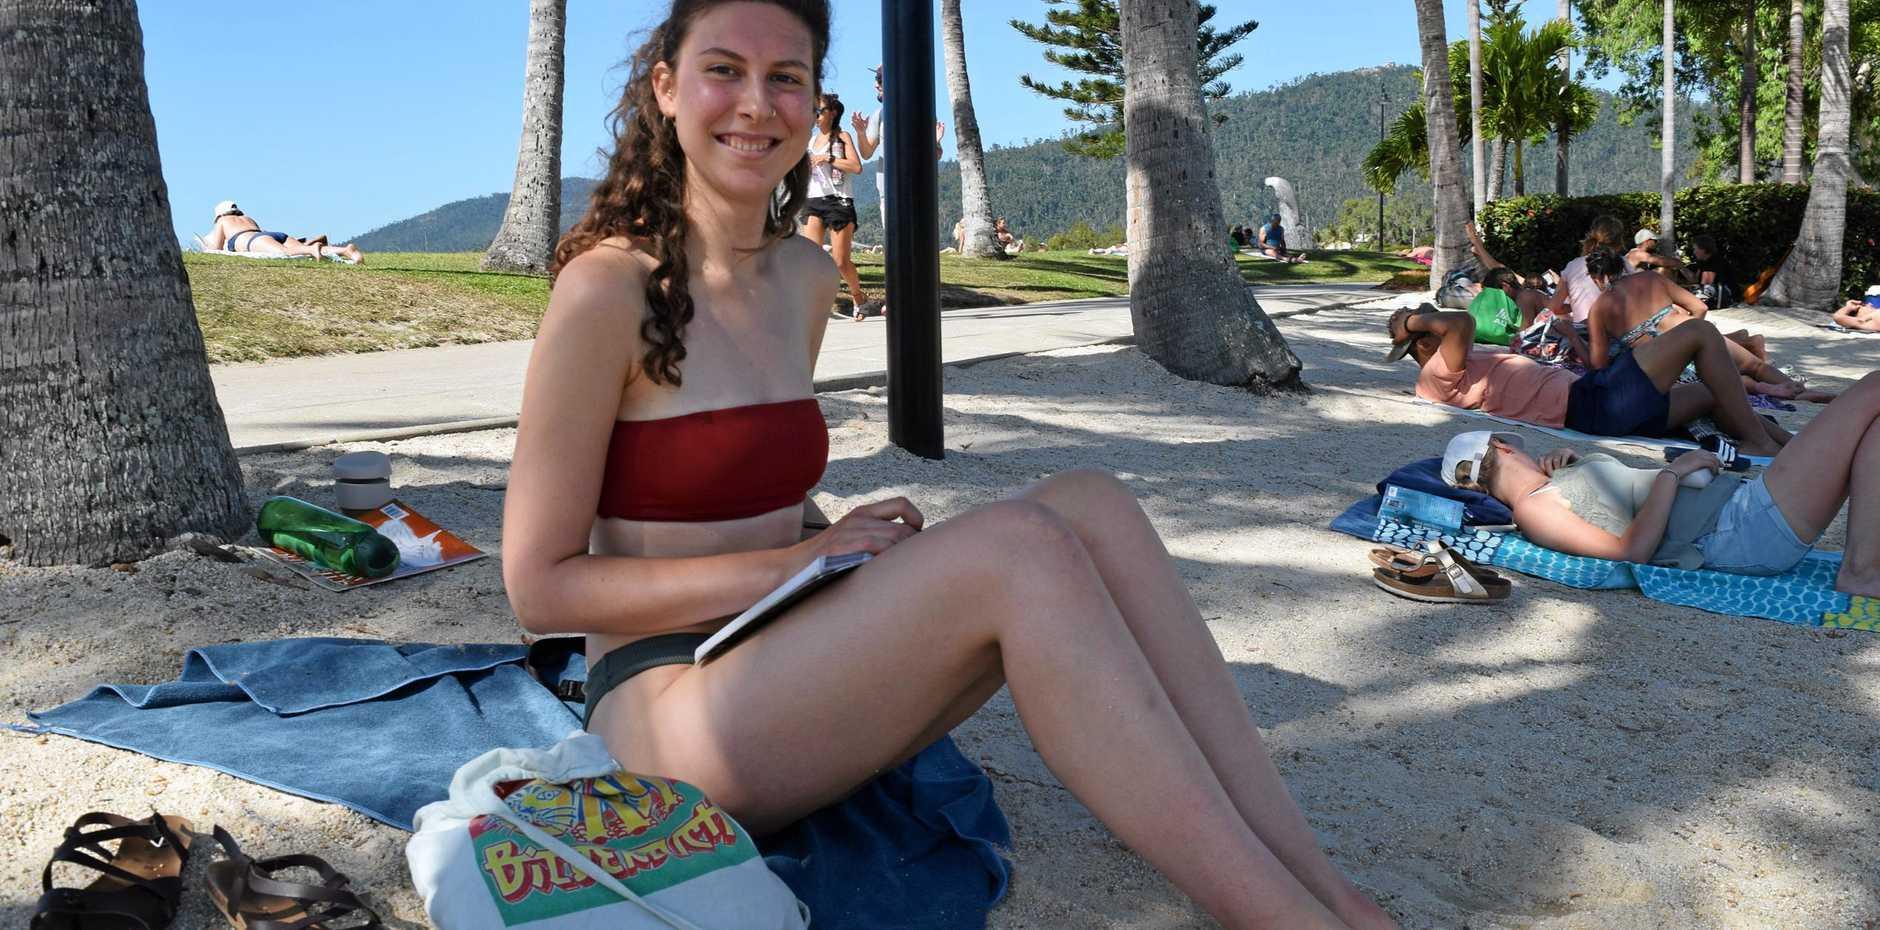 AUSSIE CHARM: Anna Peisser says she loves how Australians can make conversation anywhere.